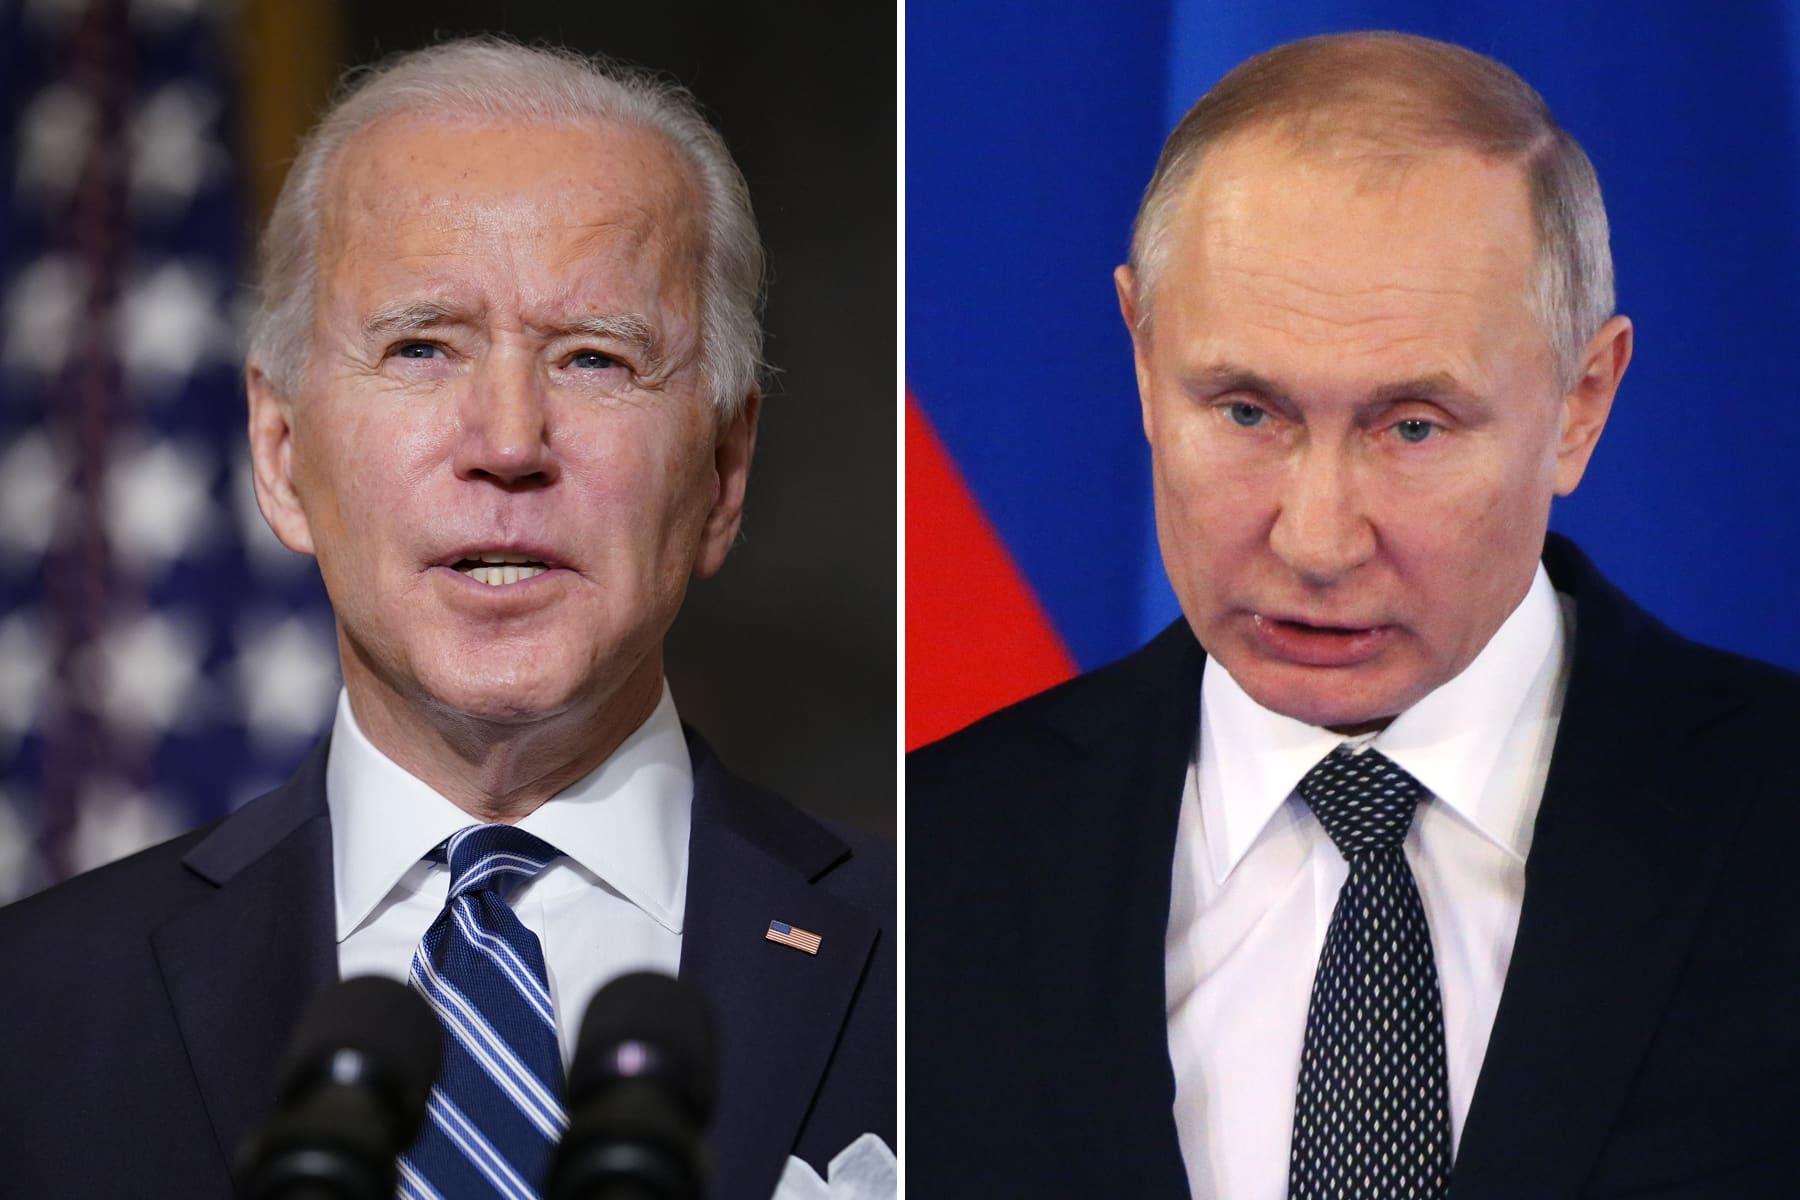 Russia tells U.S. to expect 'uncomfortable' signals ahead of Putin-Biden summit